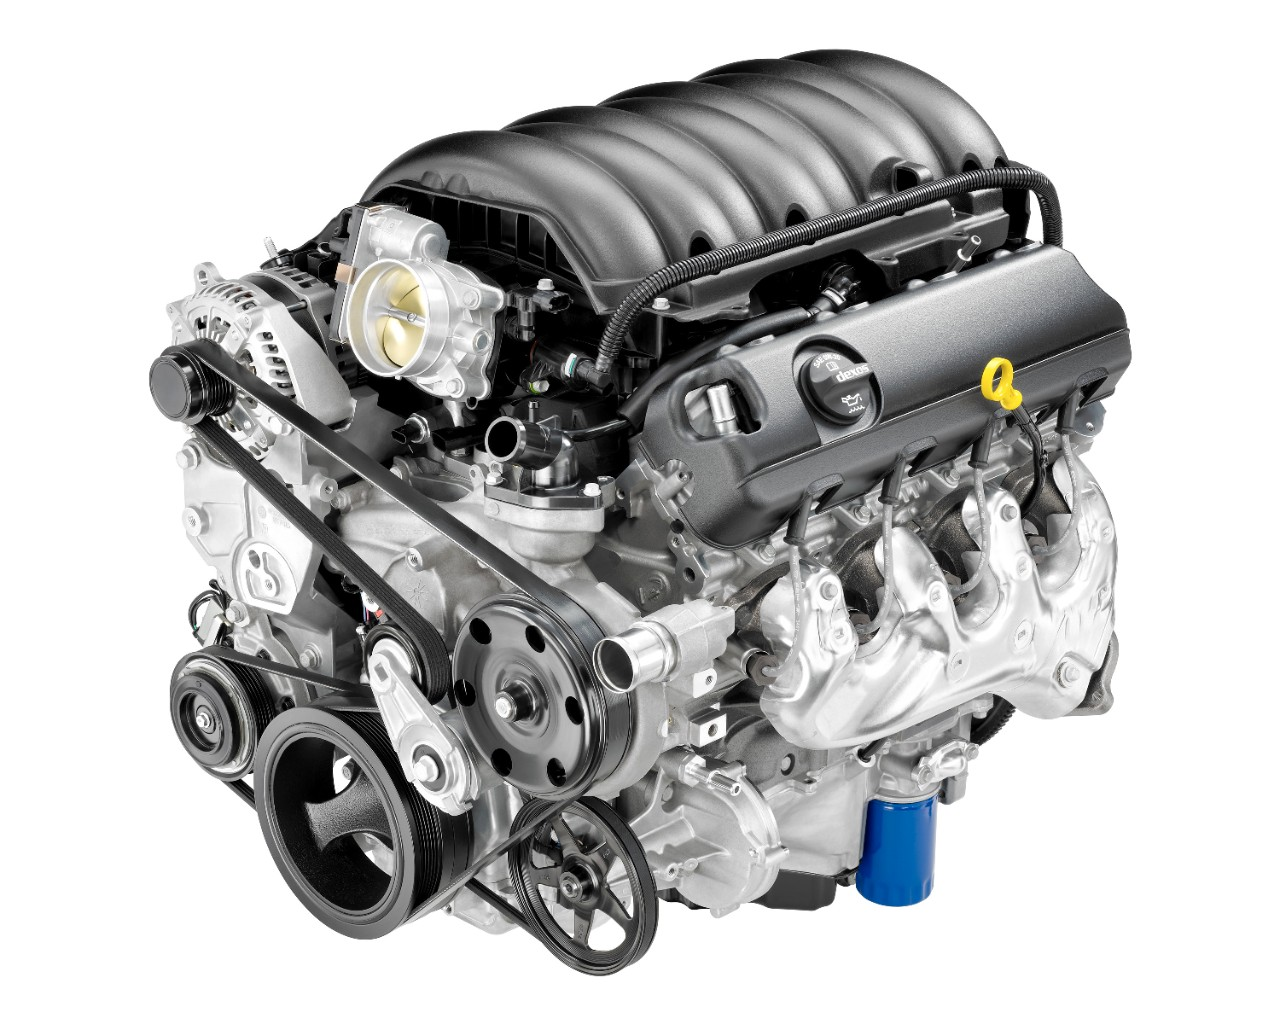 3400 Sfi Engine Diagram Firing Intertherm Heater Wiring Buick 3800